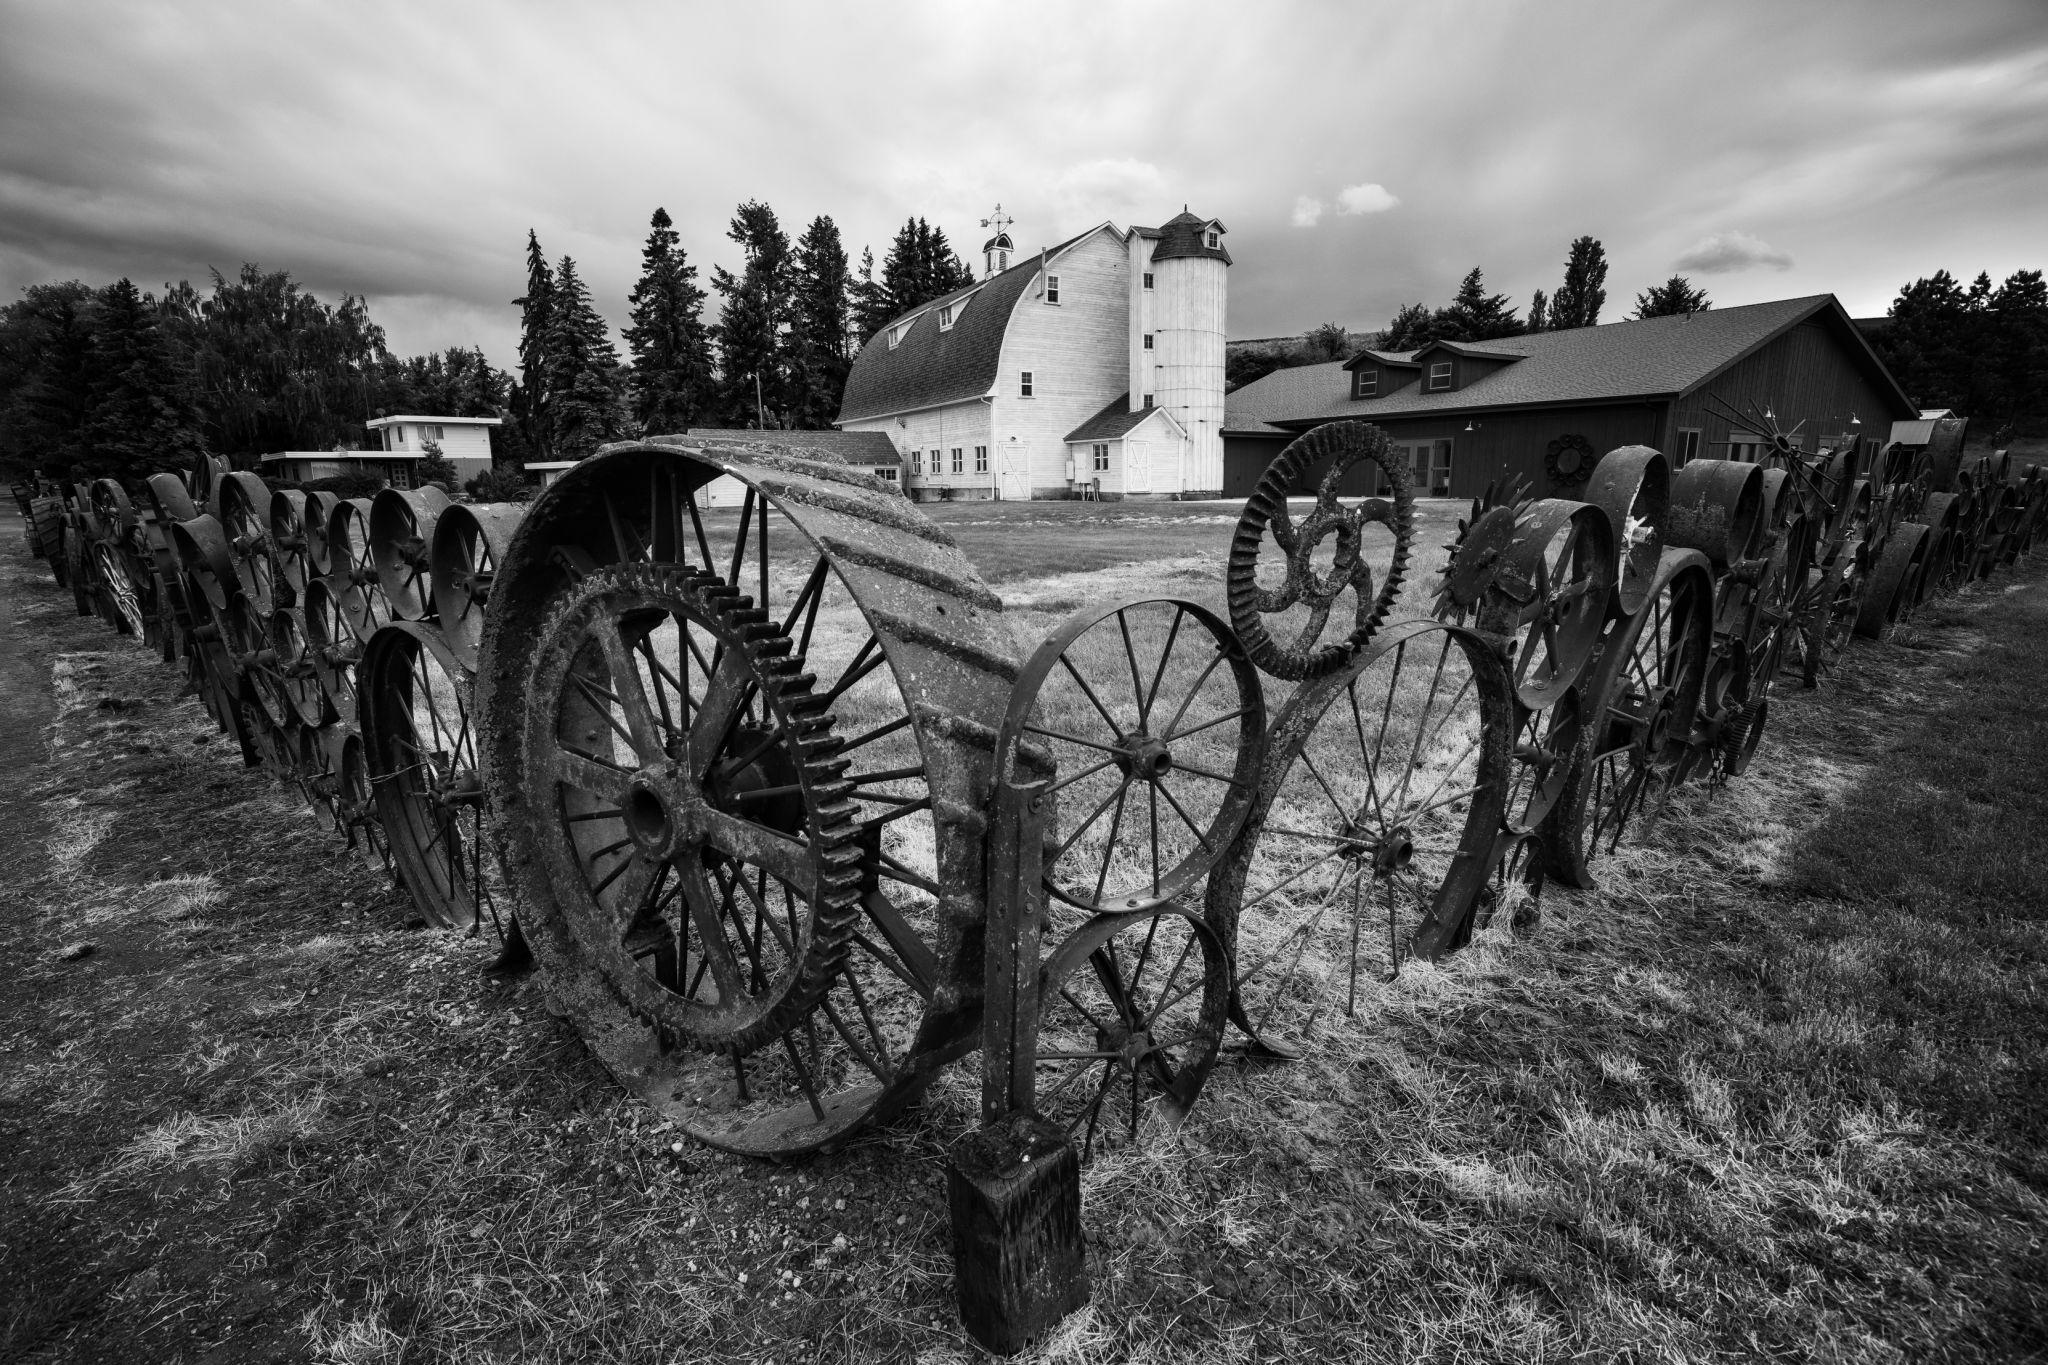 Artisans At the Dahmen Barn, USA